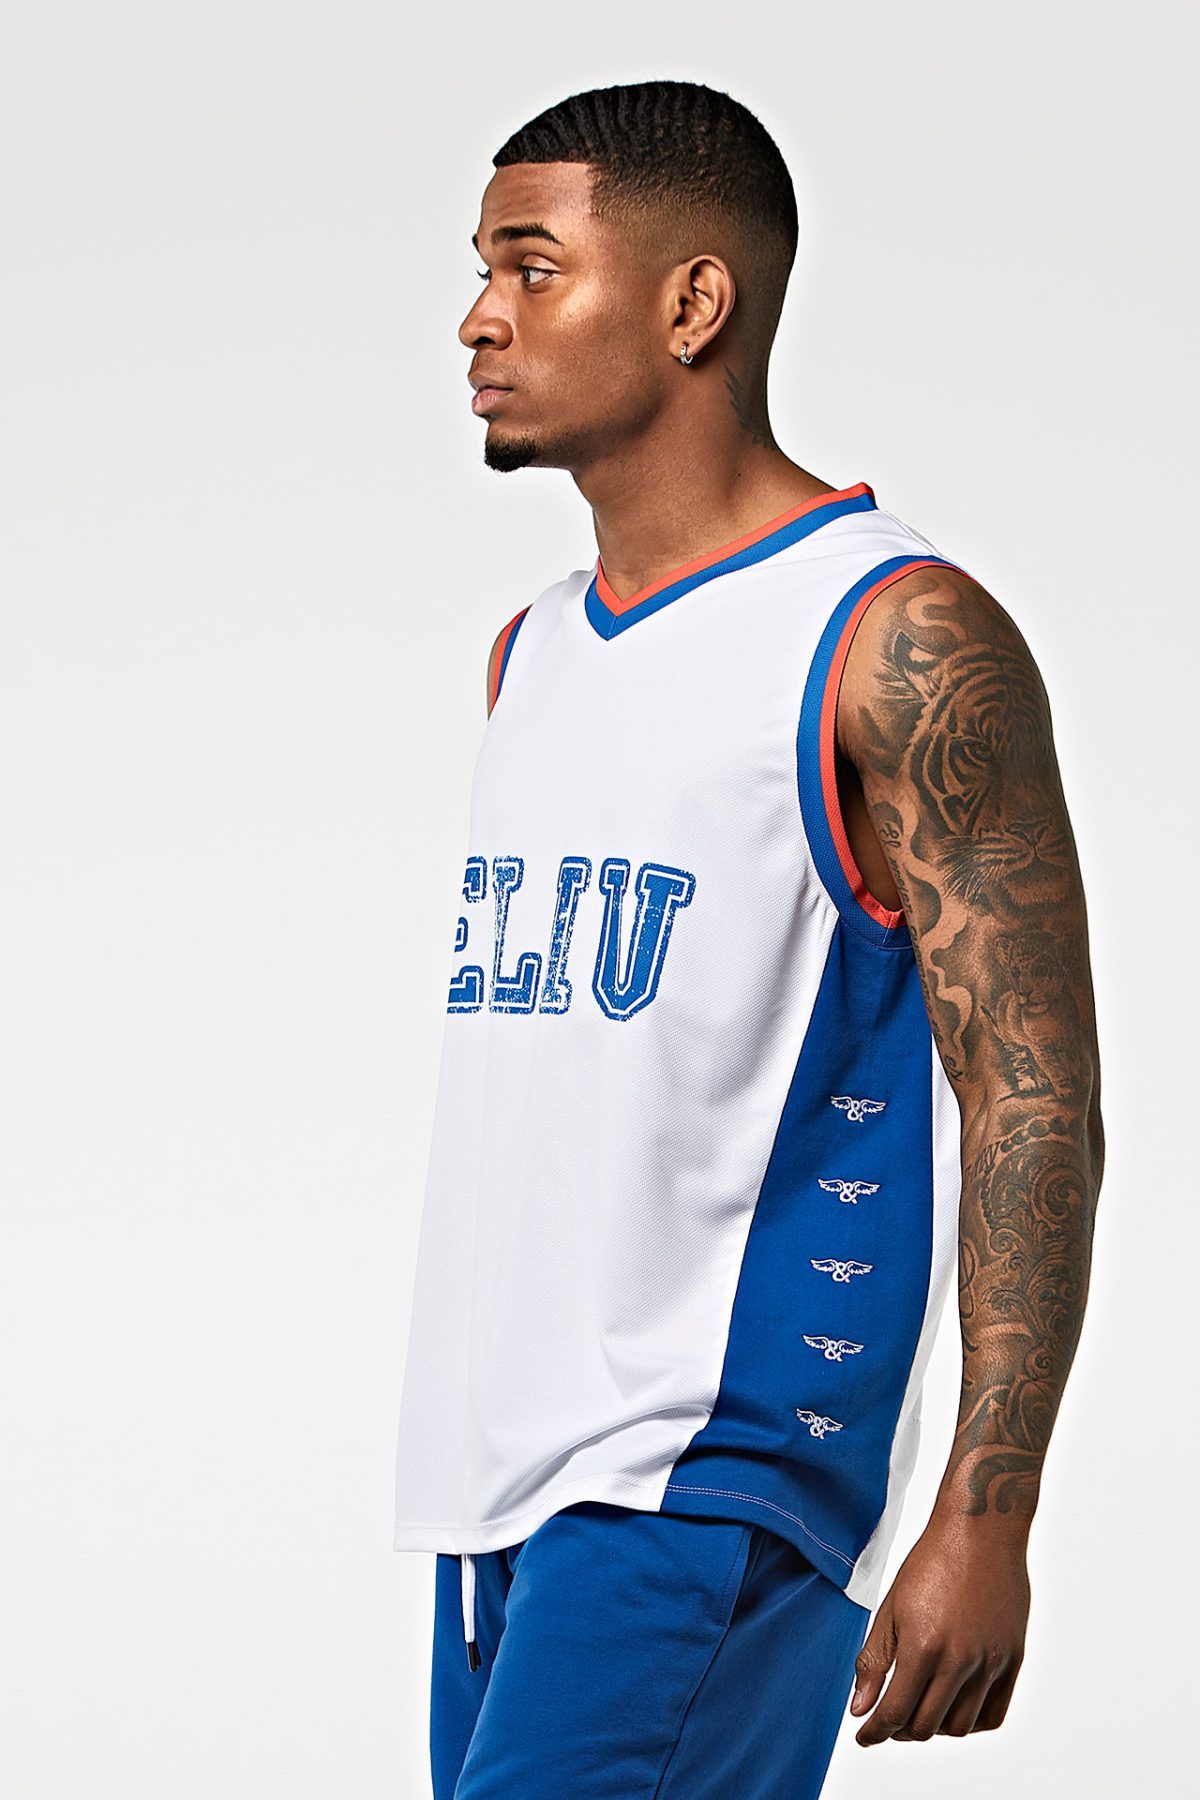 Camiseta de baloncesto ELIU 97 blanca